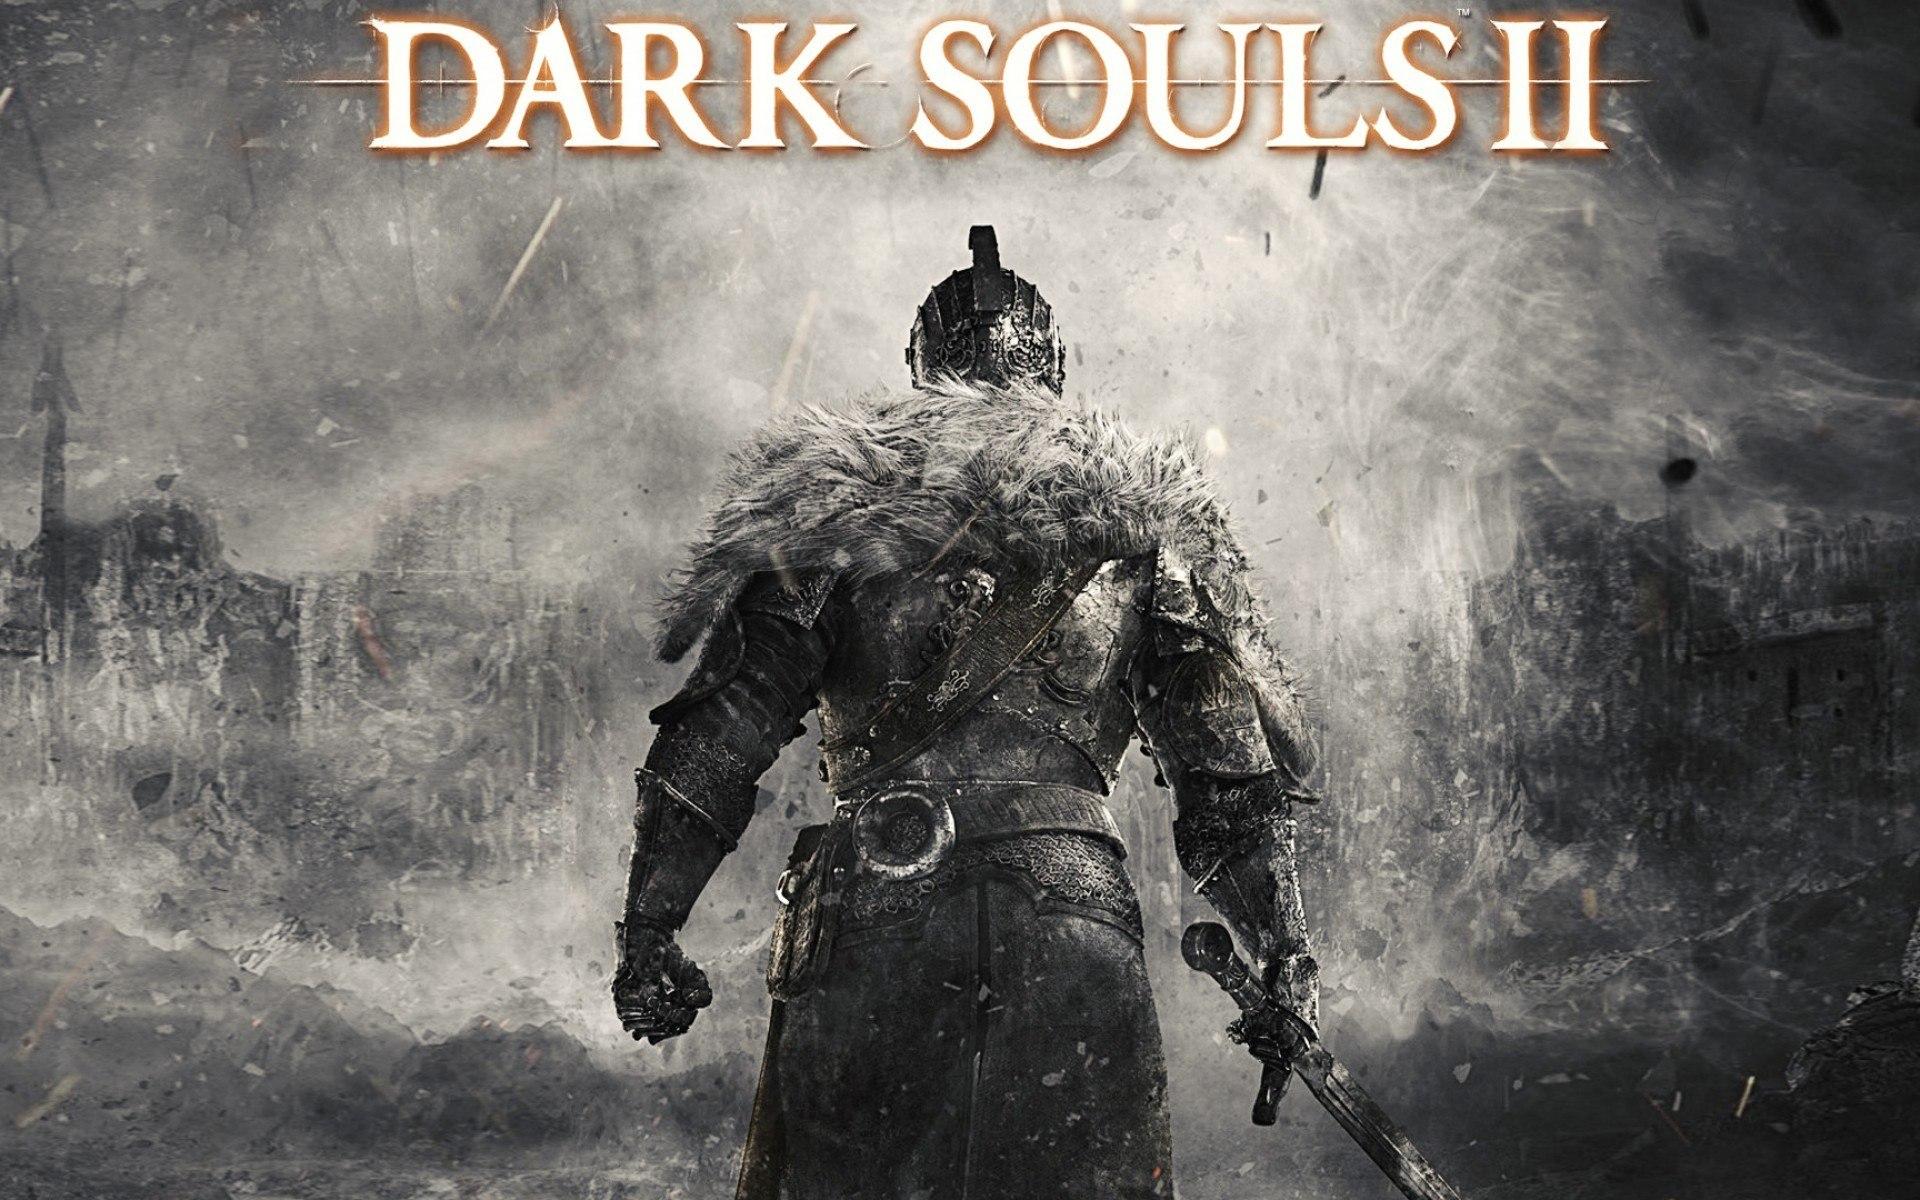 dark souls 2 wallpaper Dark Souls 2 1920x1200